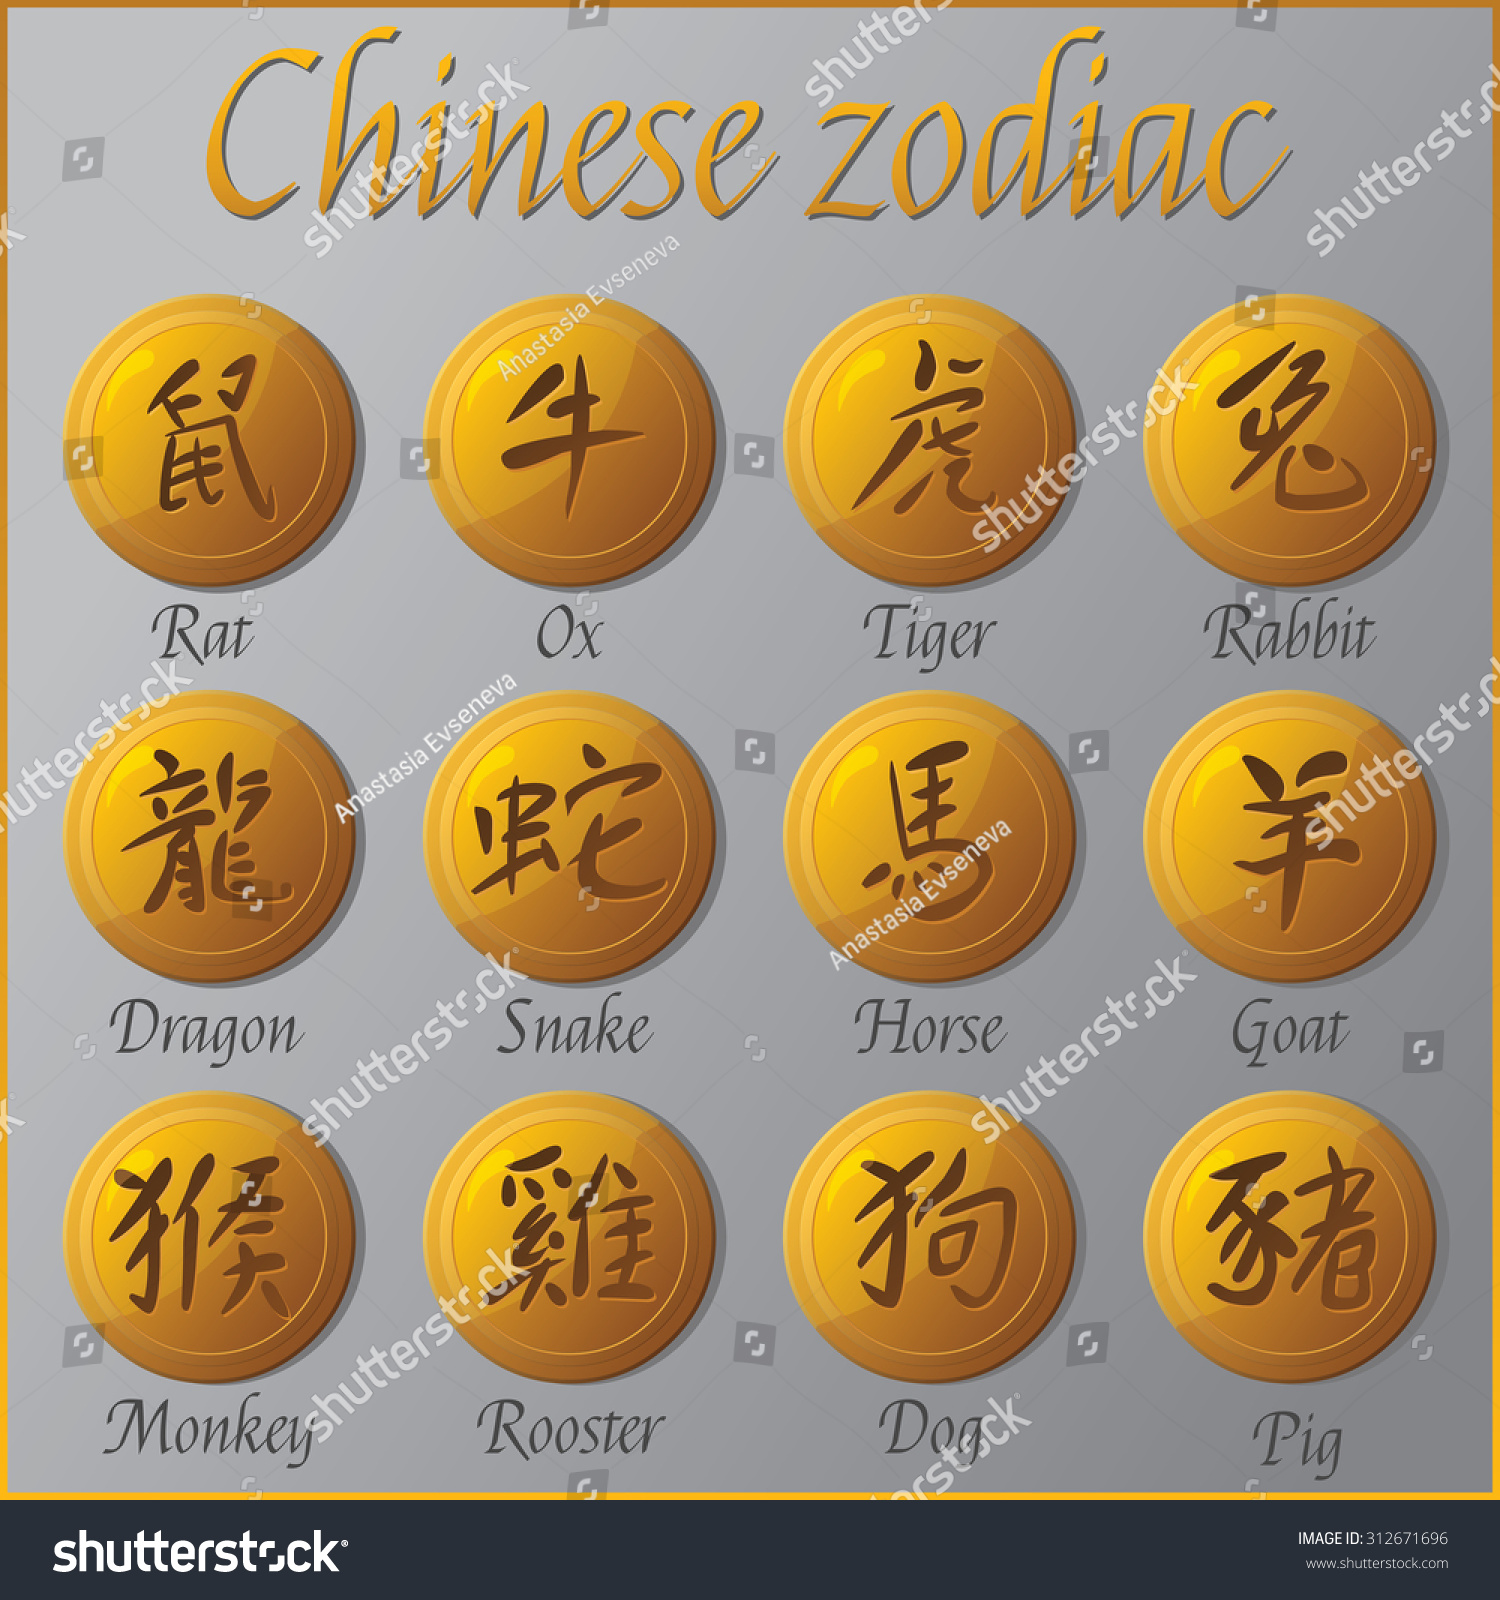 Horoscope Chinese Zodiac Symbols Vector Illustration Stock Vector